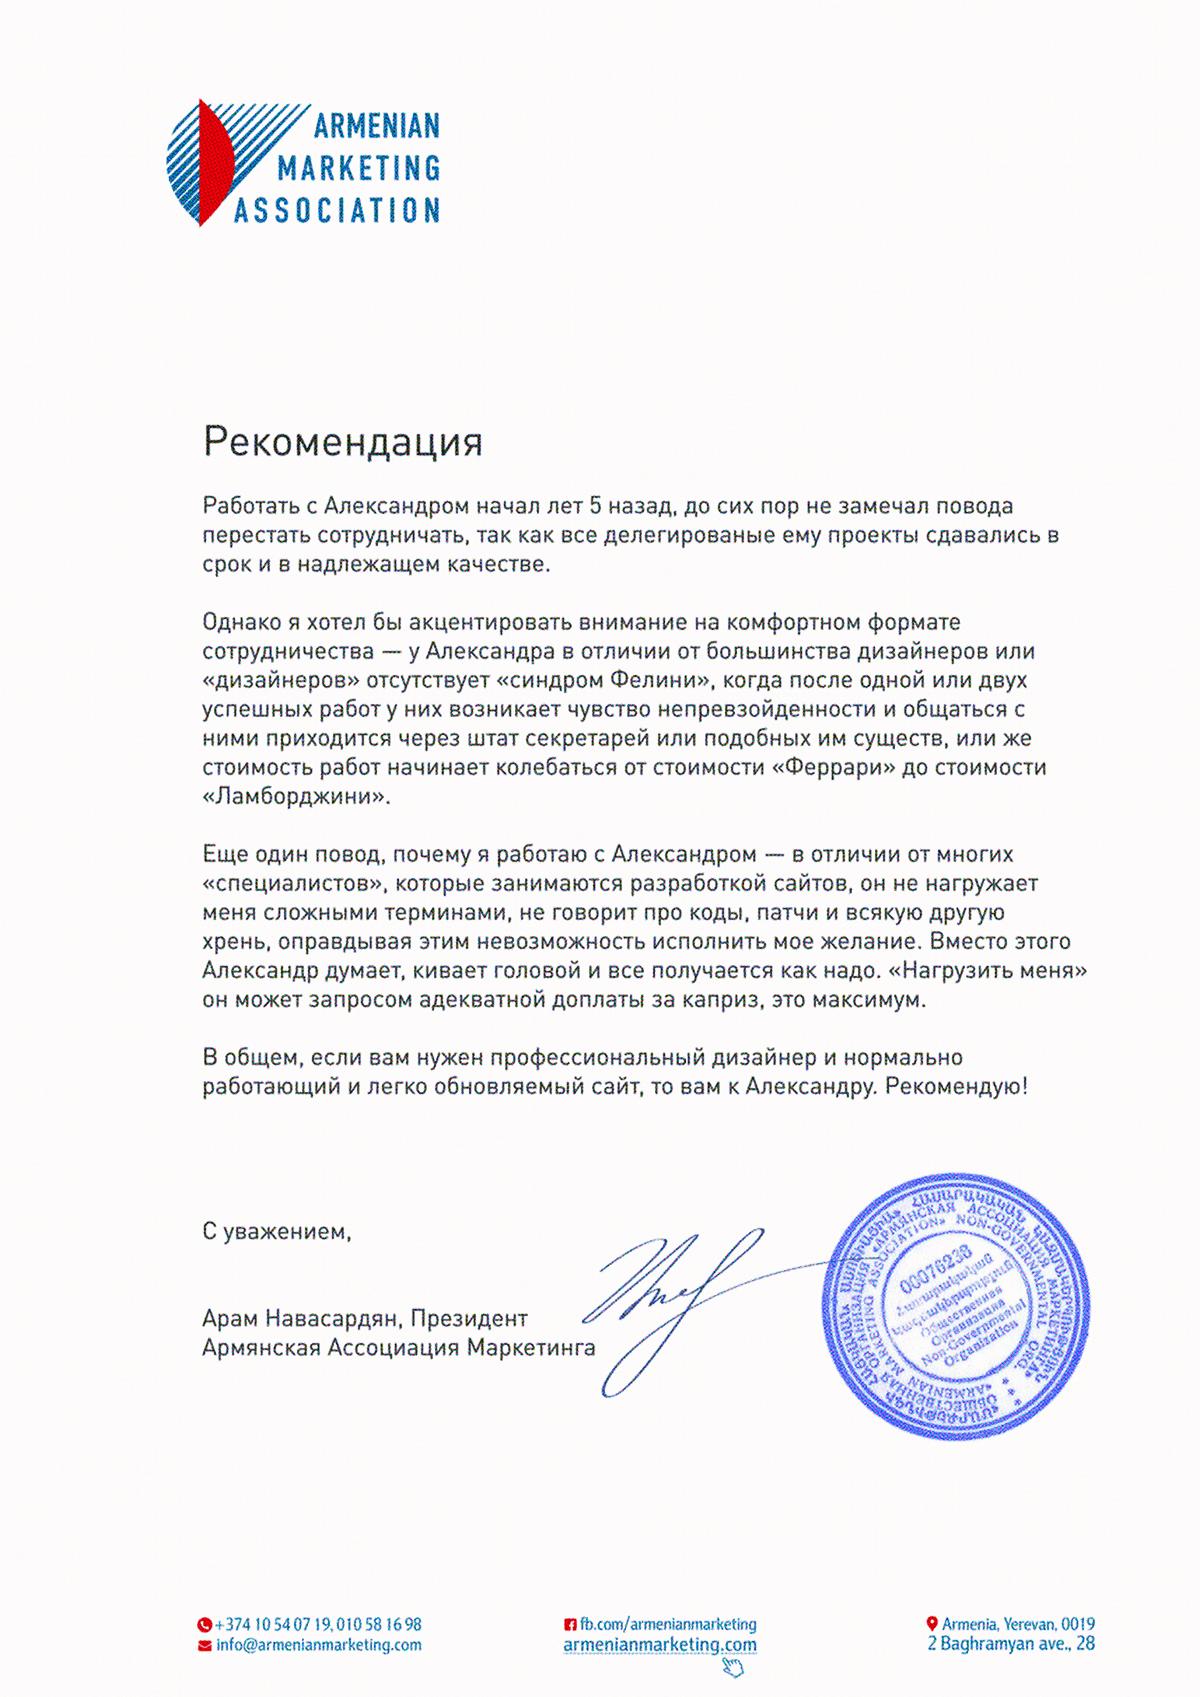 Отзыв от Армянской Ассоциации Маркетинга